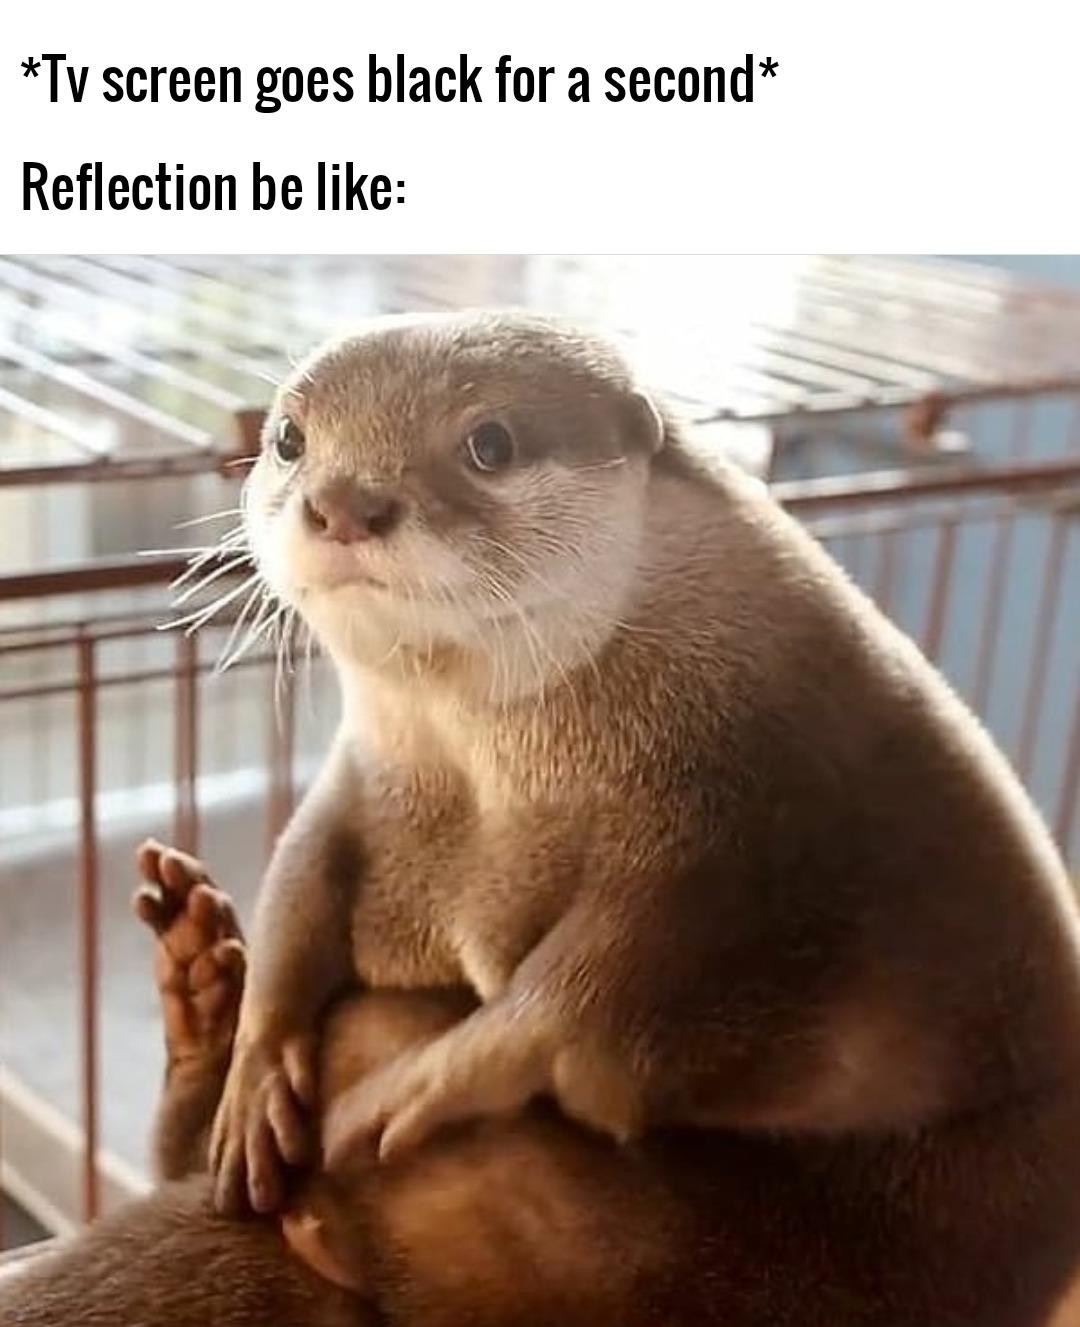 Some wholesome motivational stuff - meme